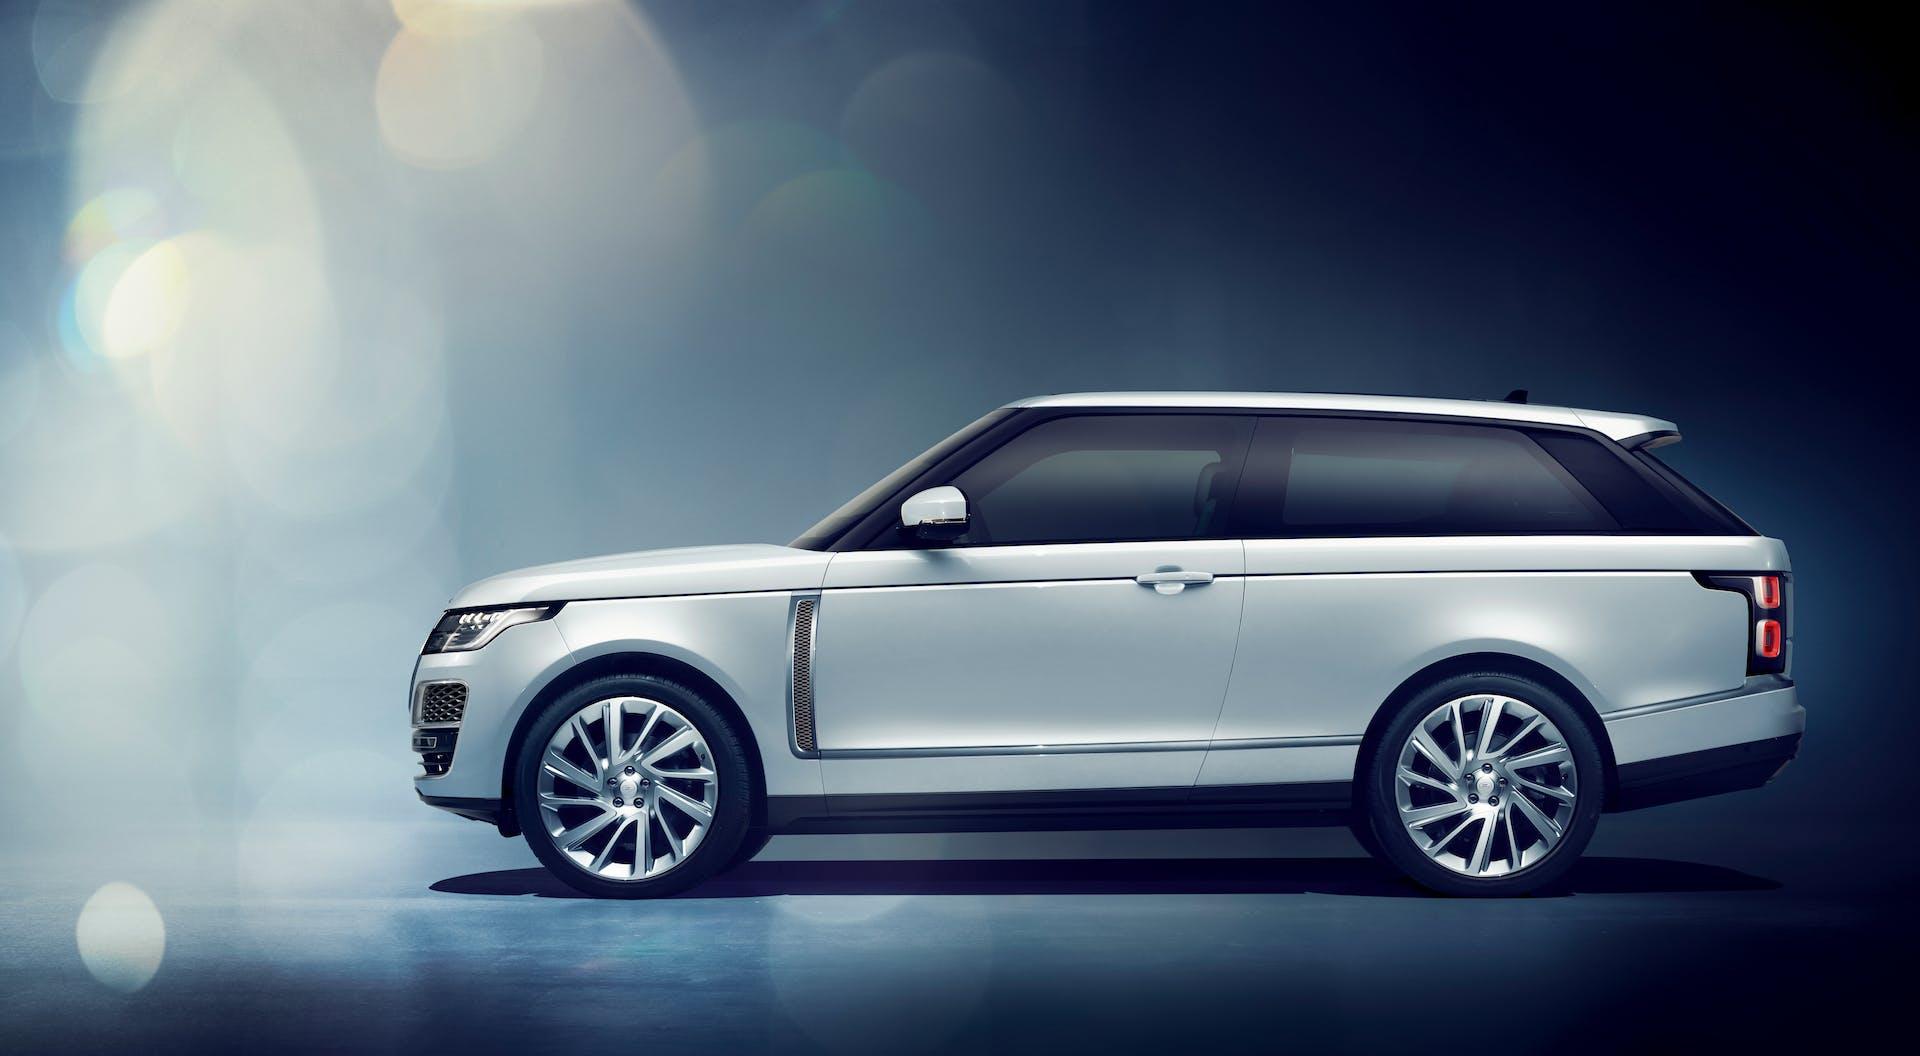 range rover sv coupé bianca studio laterale